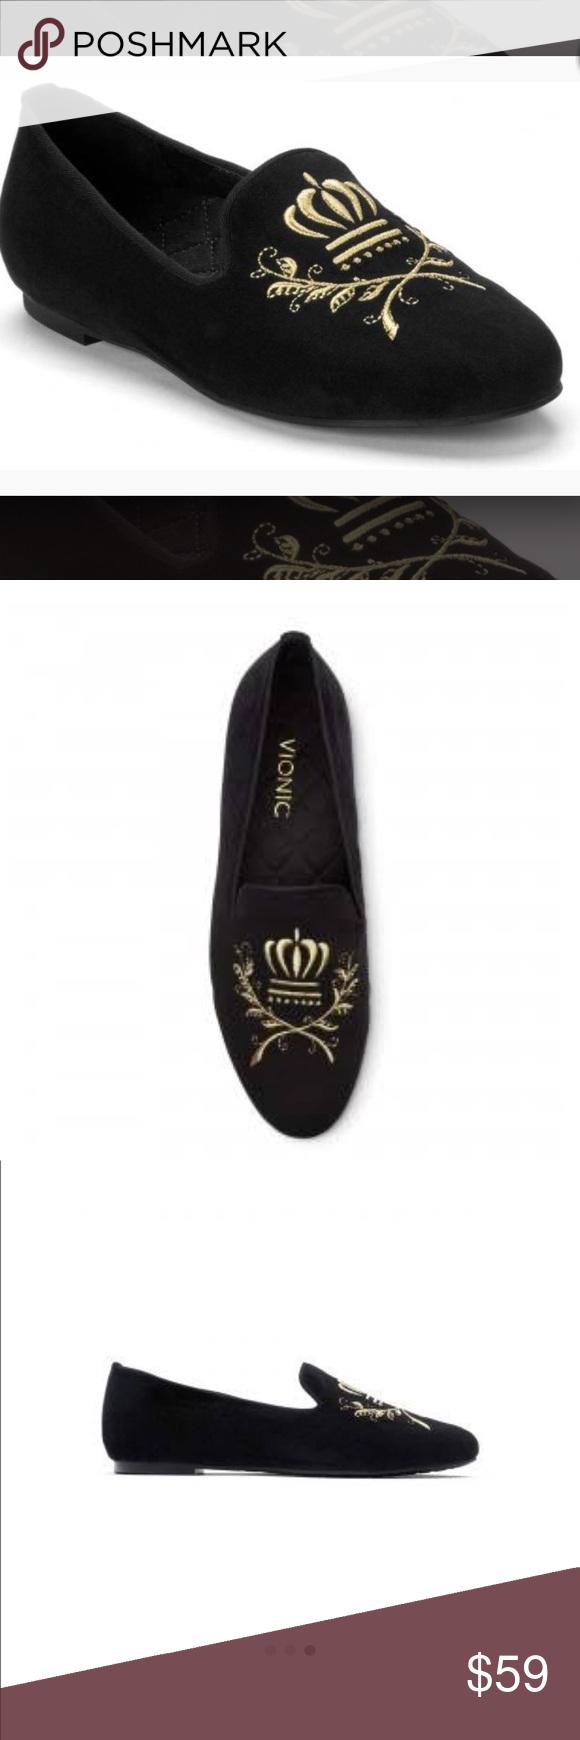 Detail Loafer NWT Vionic Snug Romi